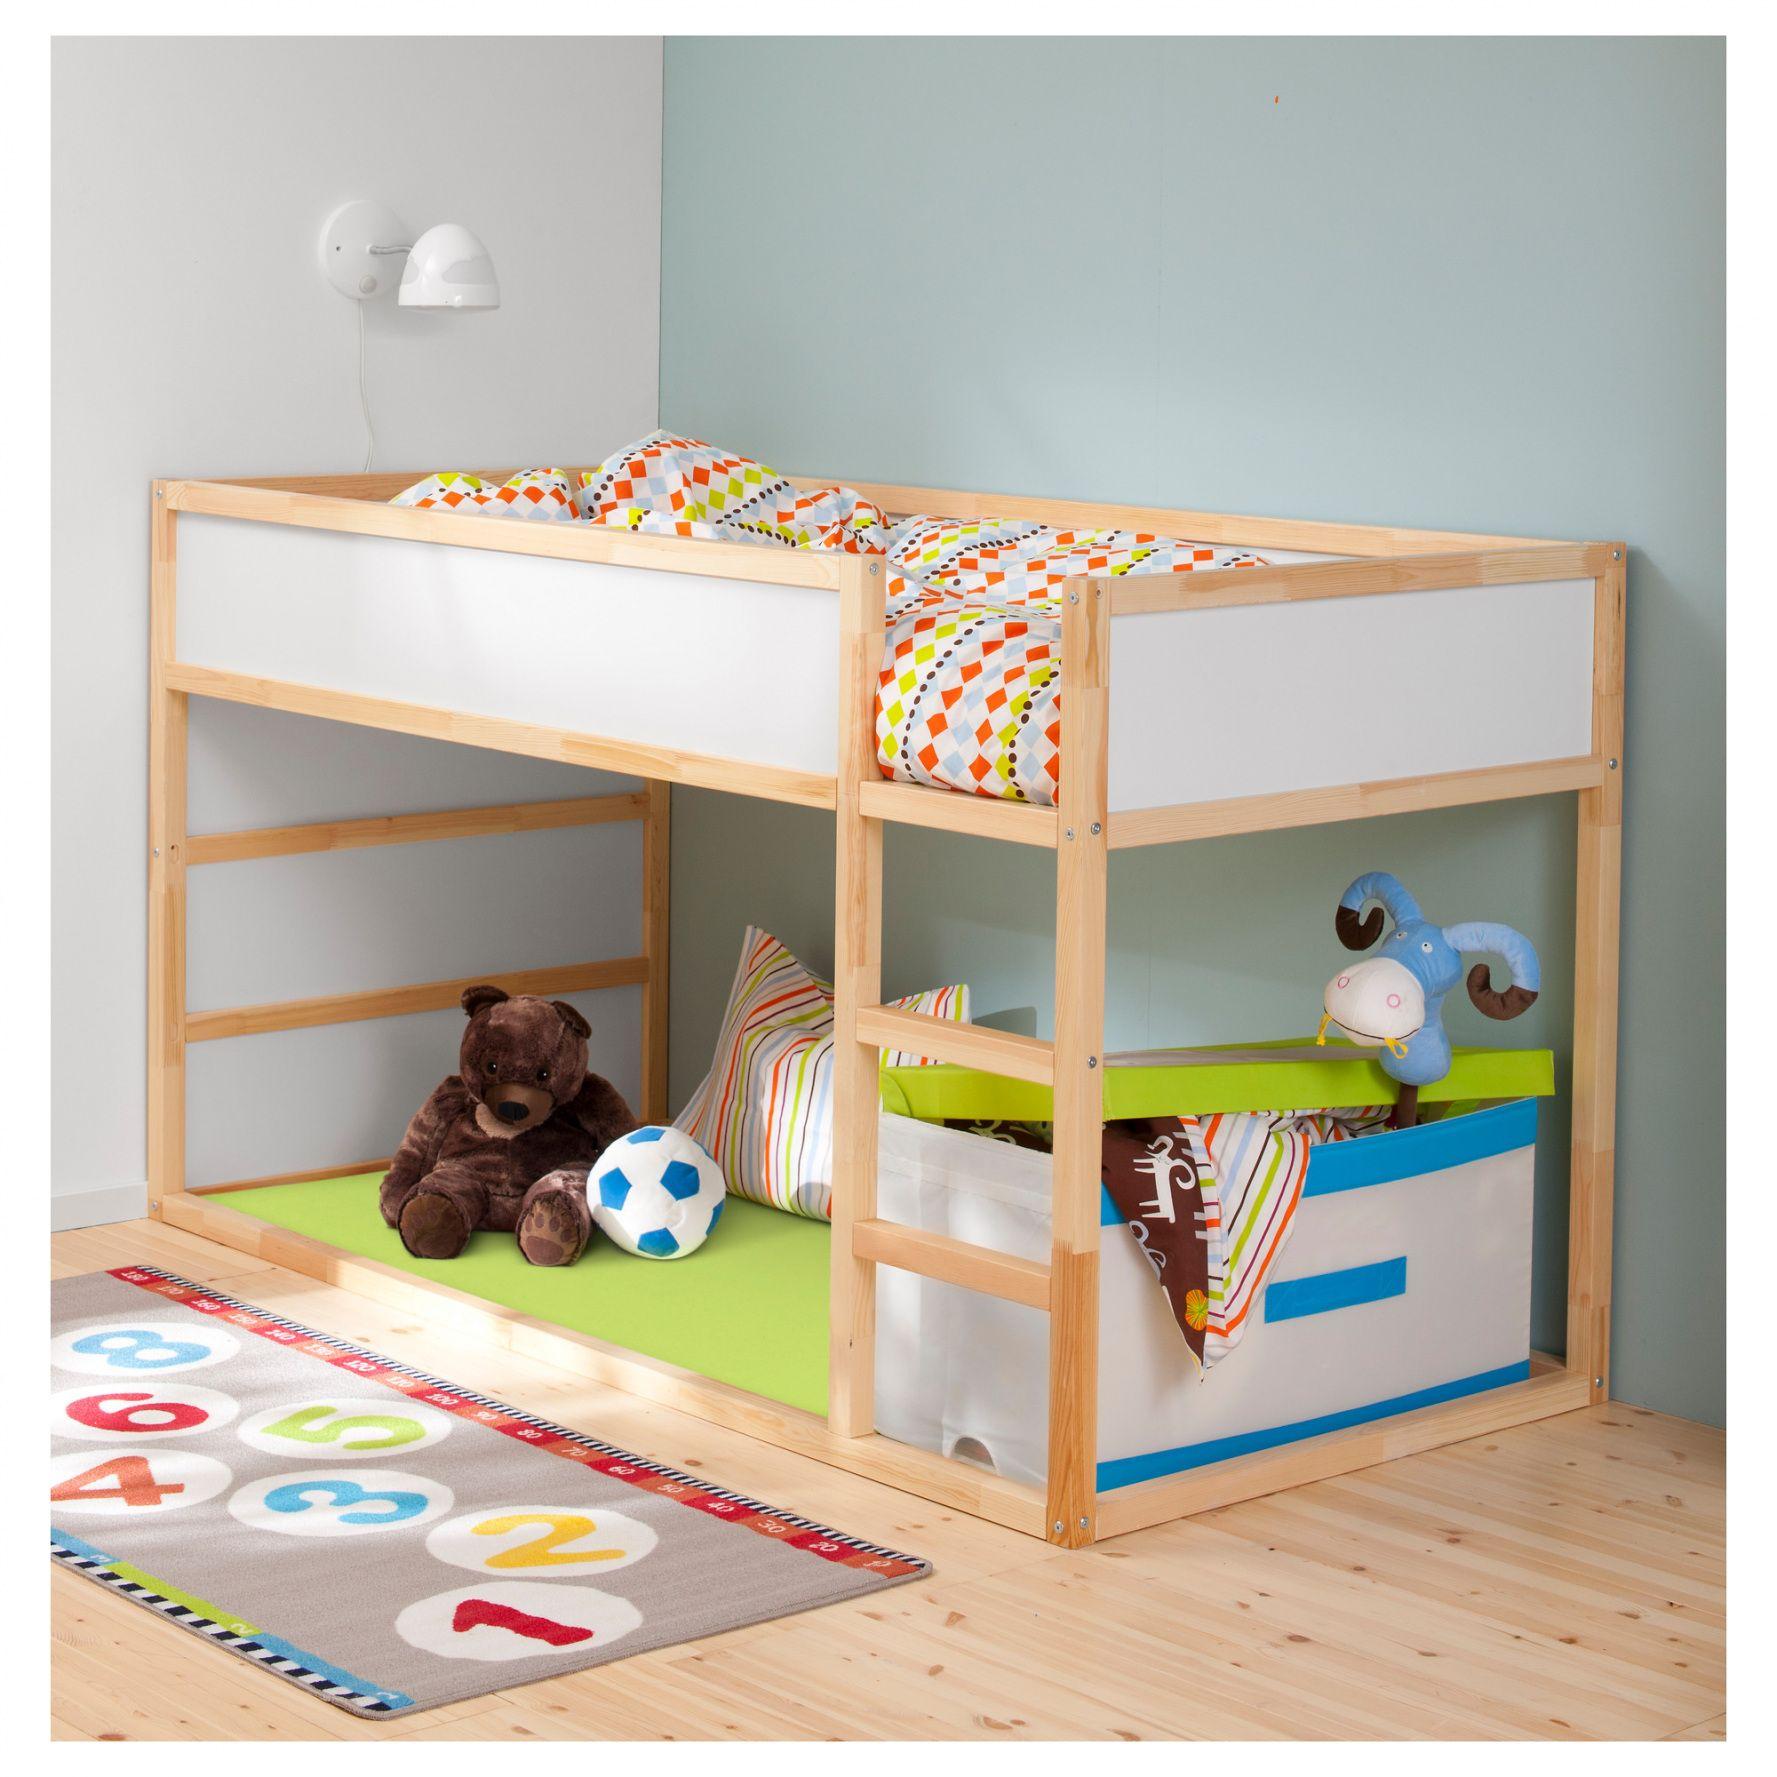 20 Ikea Children Bunk Bed Interior Design Bedroom Ideas Check